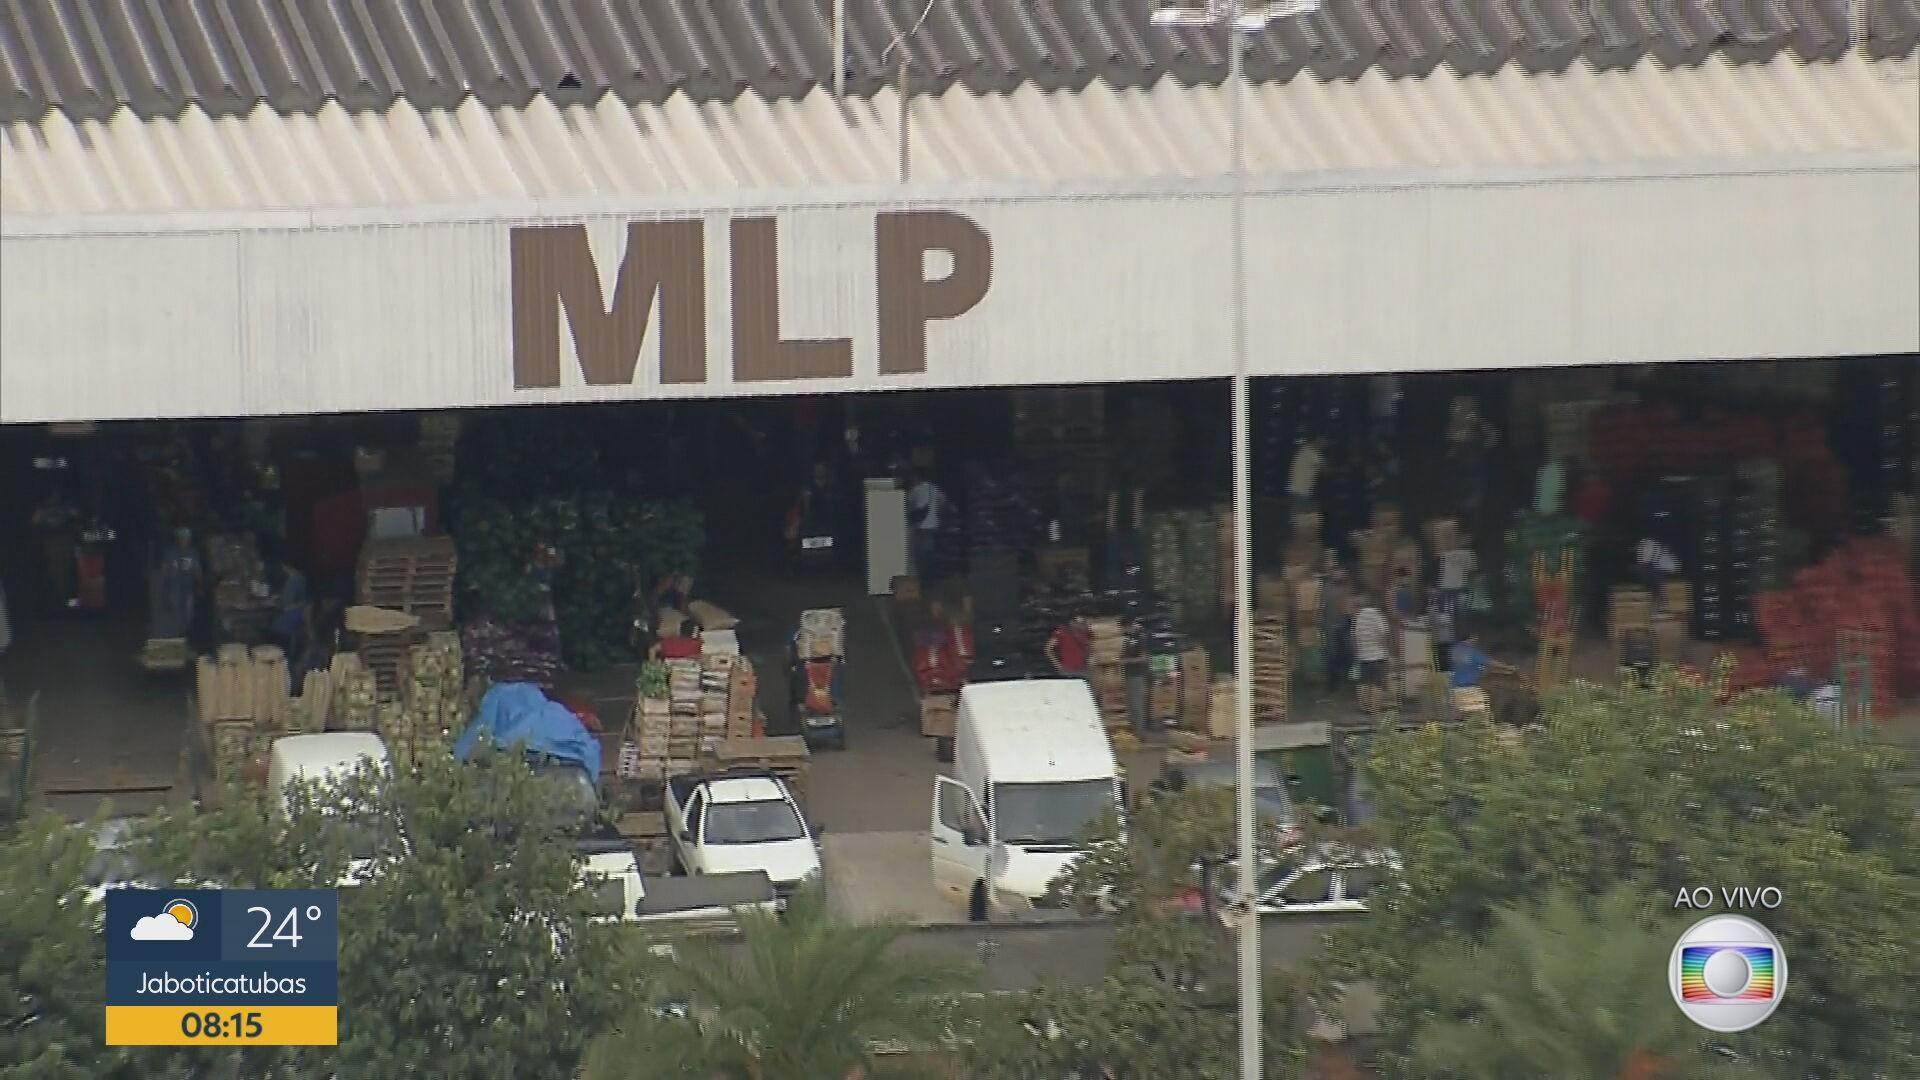 Polícia investiga vídeo postado por Bolsonaro que mostrava Ceasa da Grande BH vazia